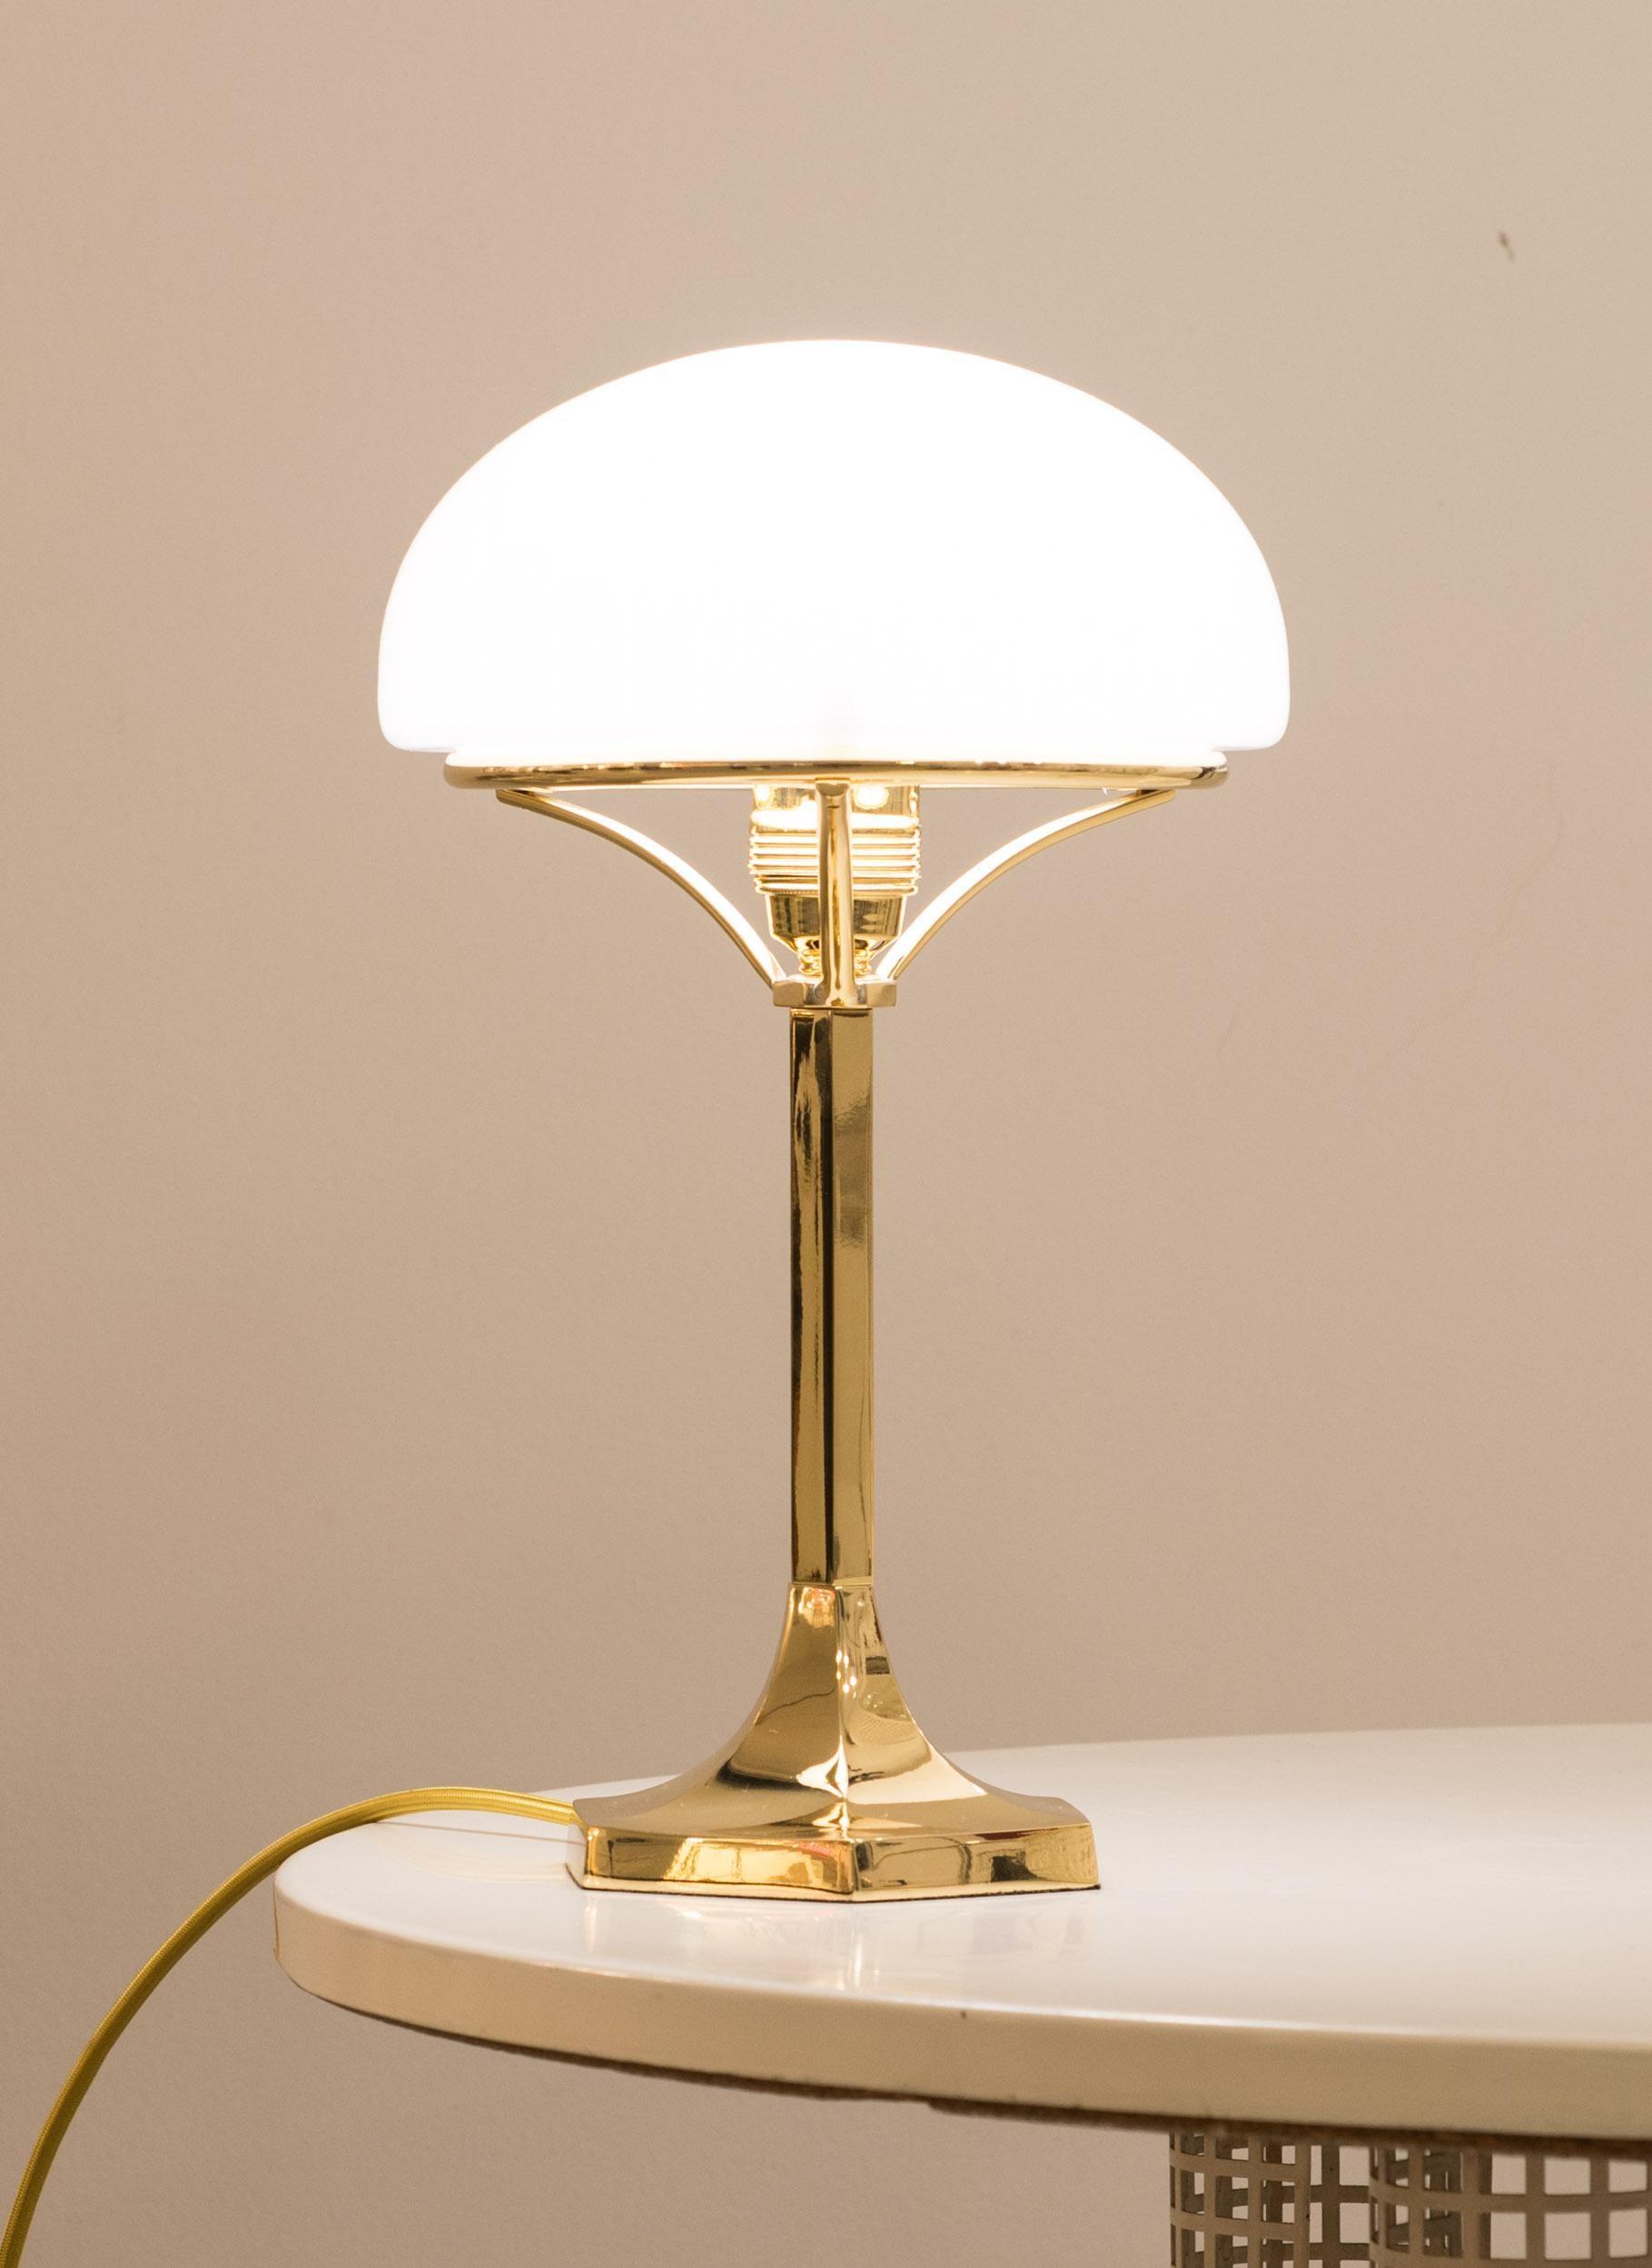 Table Lamp Re Edition, Woka Lamps